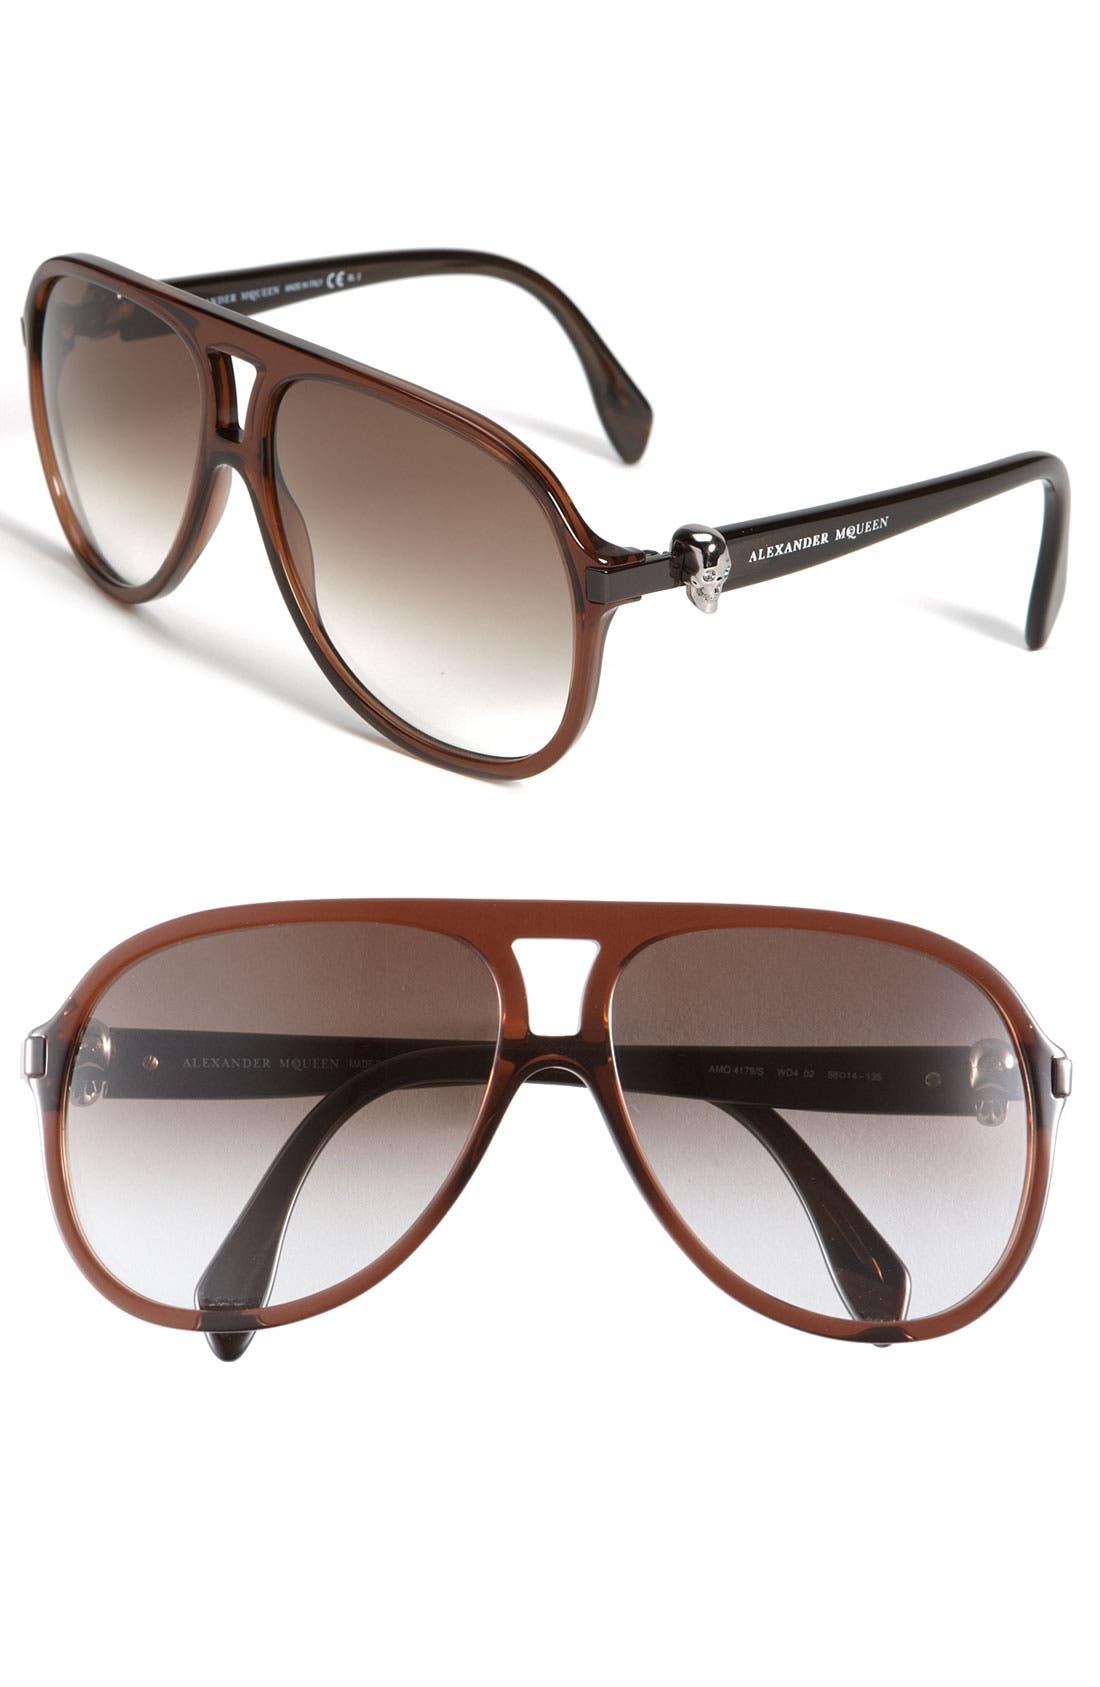 Alternate Image 1 Selected - Alexander McQueen Aviator Sunglasses